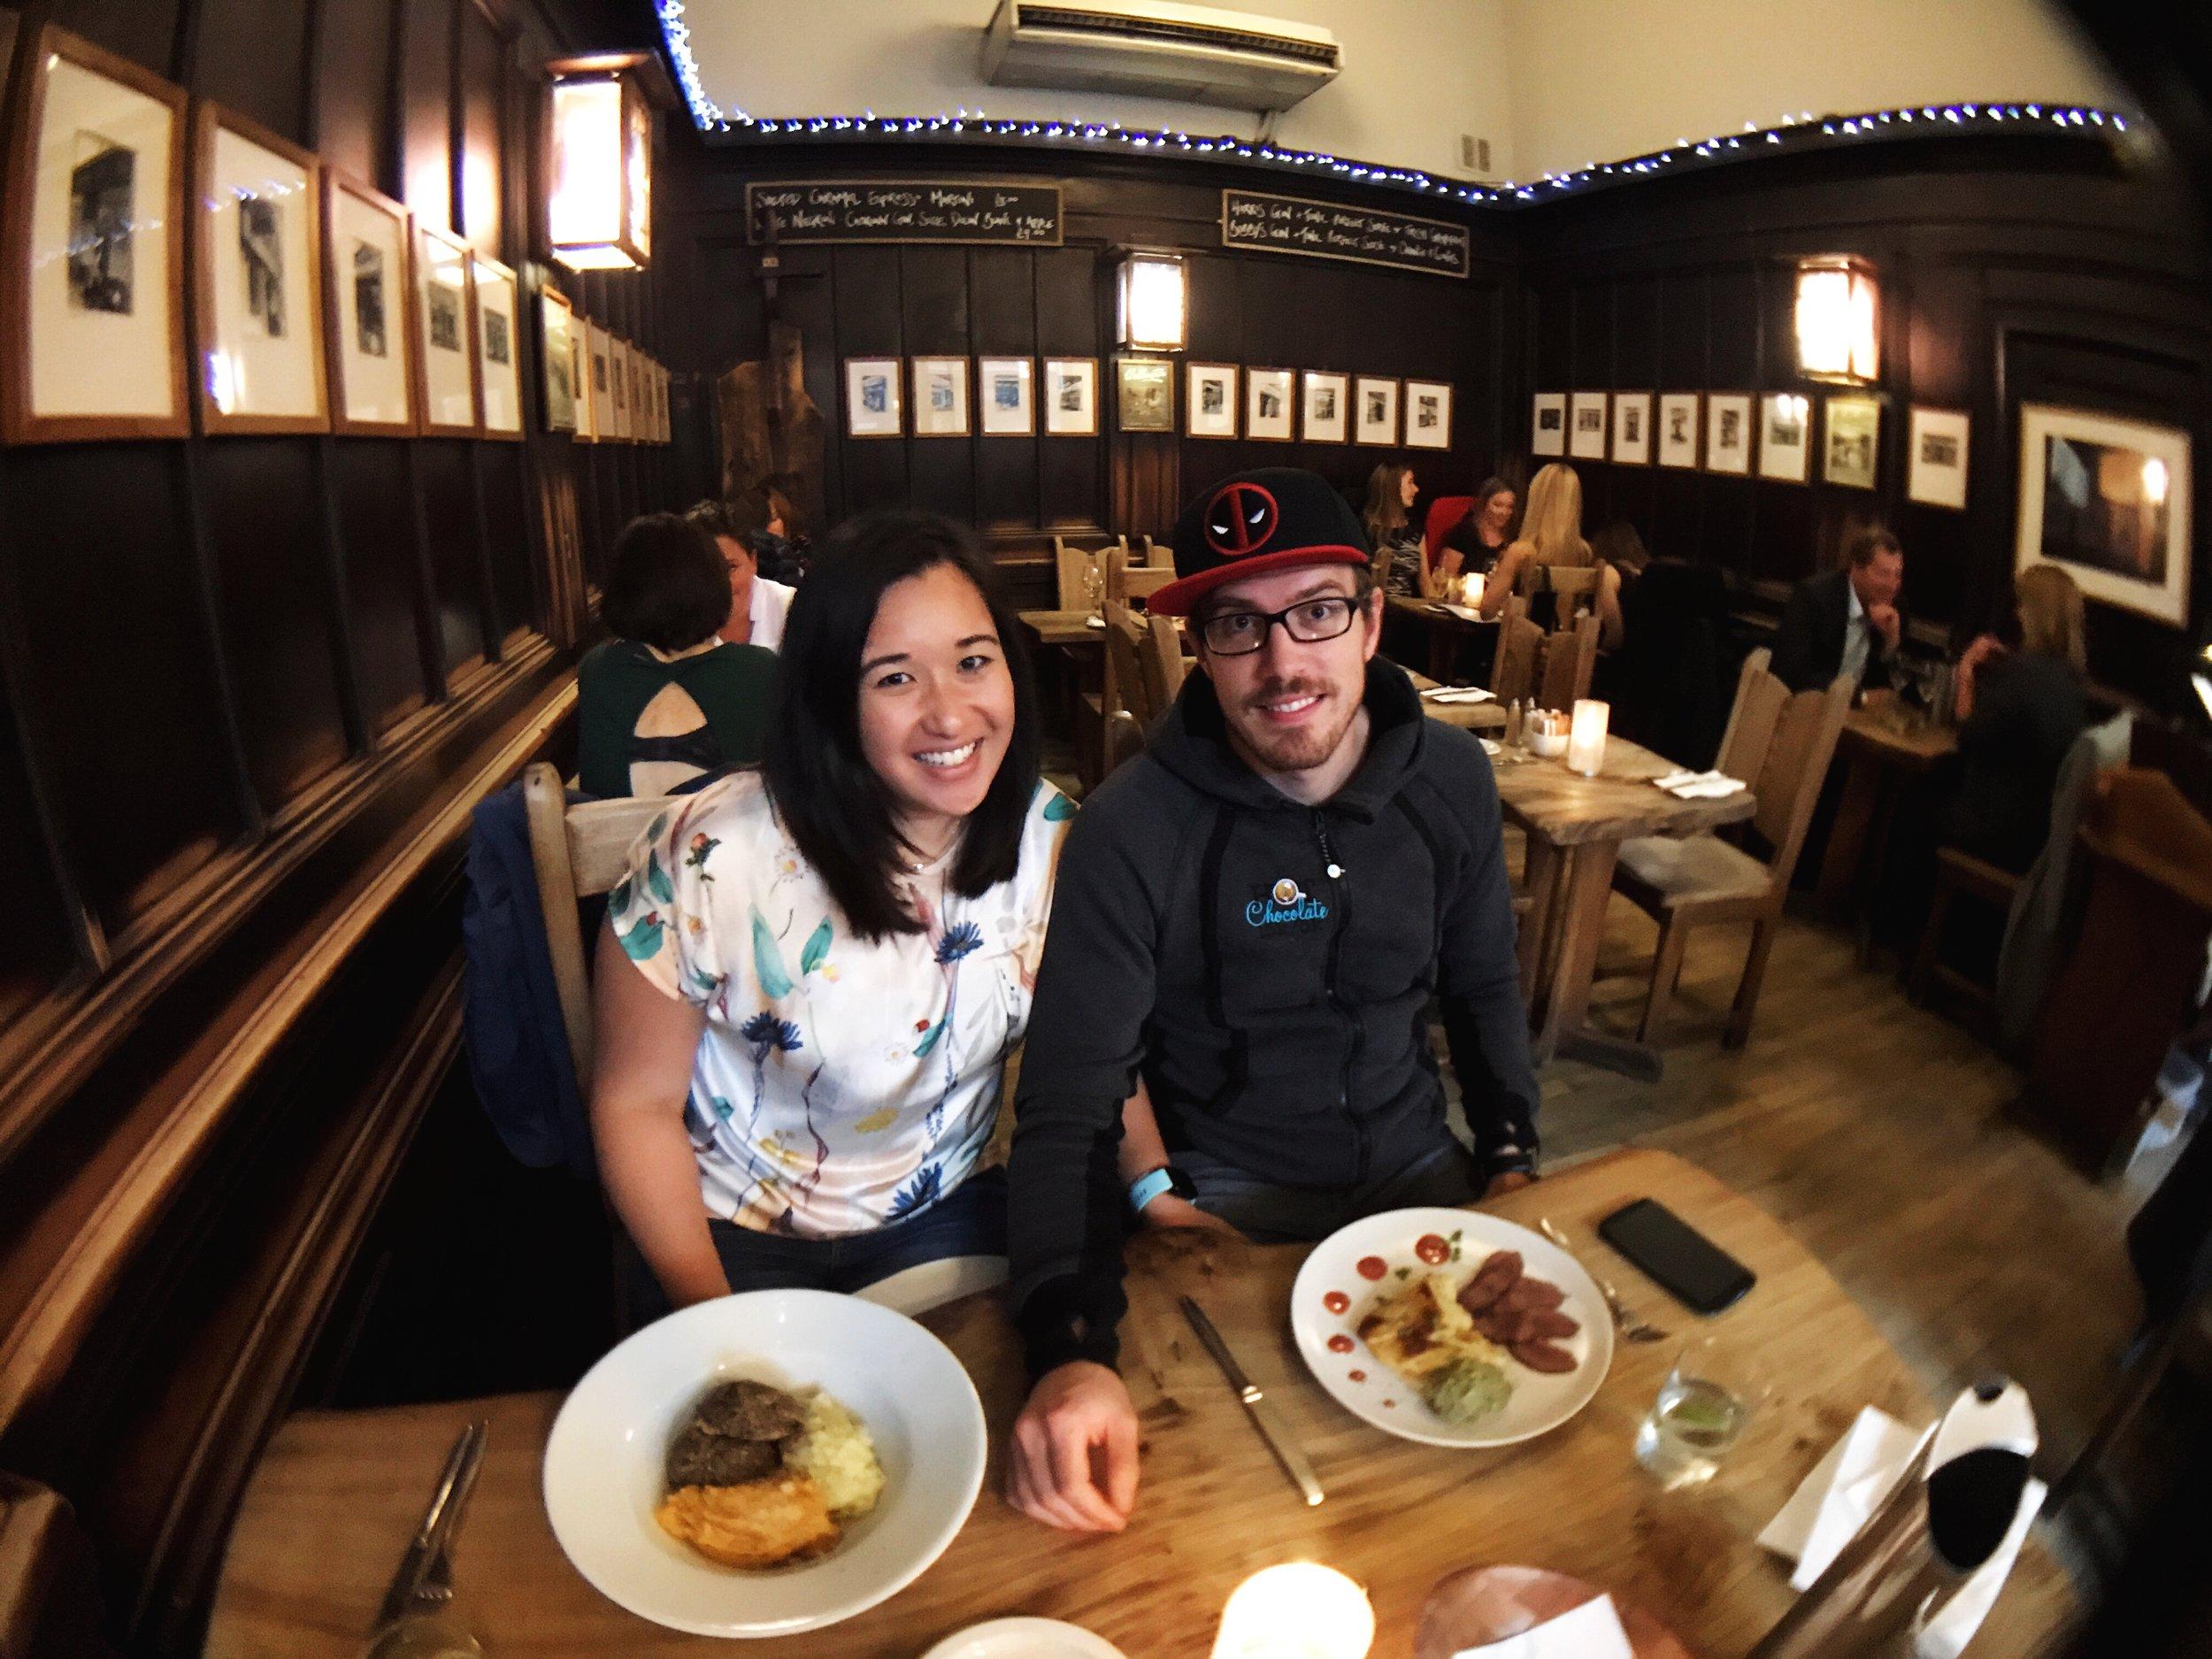 Dinner at Cafe Gandolfi in Merchant City, Glasgow